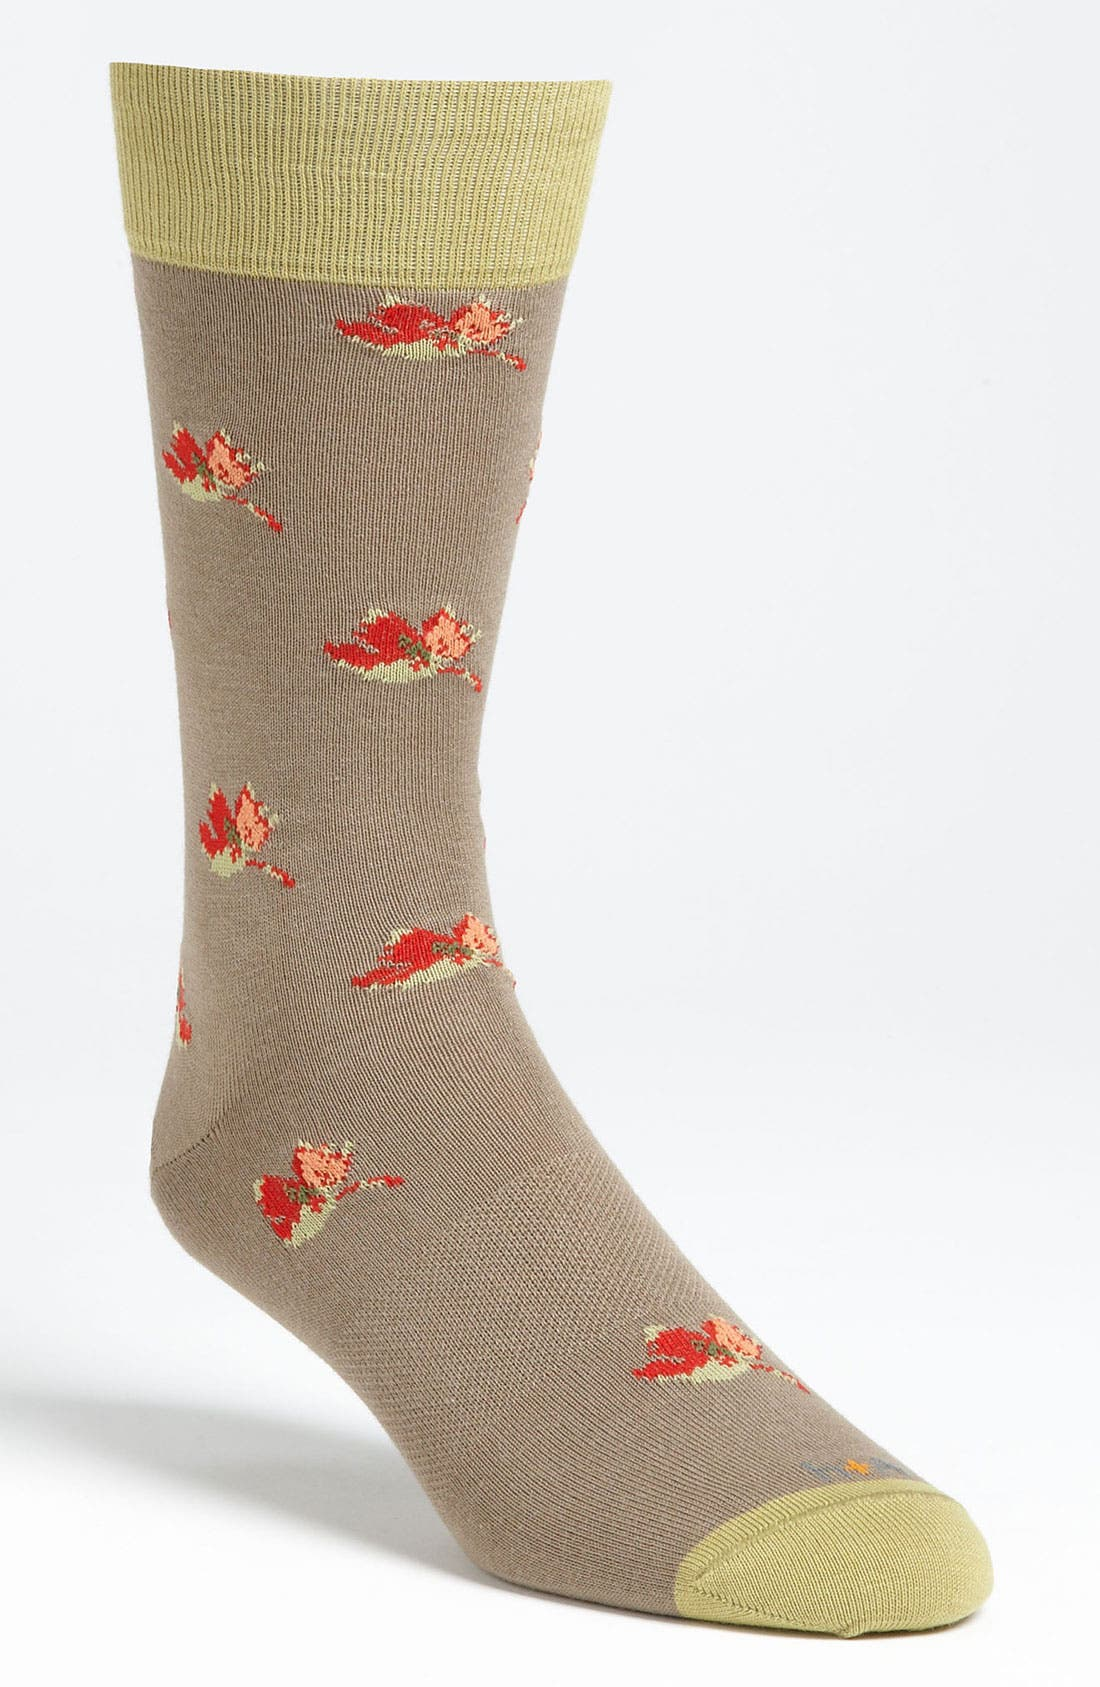 Main Image - hook + ALBERT 'Falling Leaves' Socks